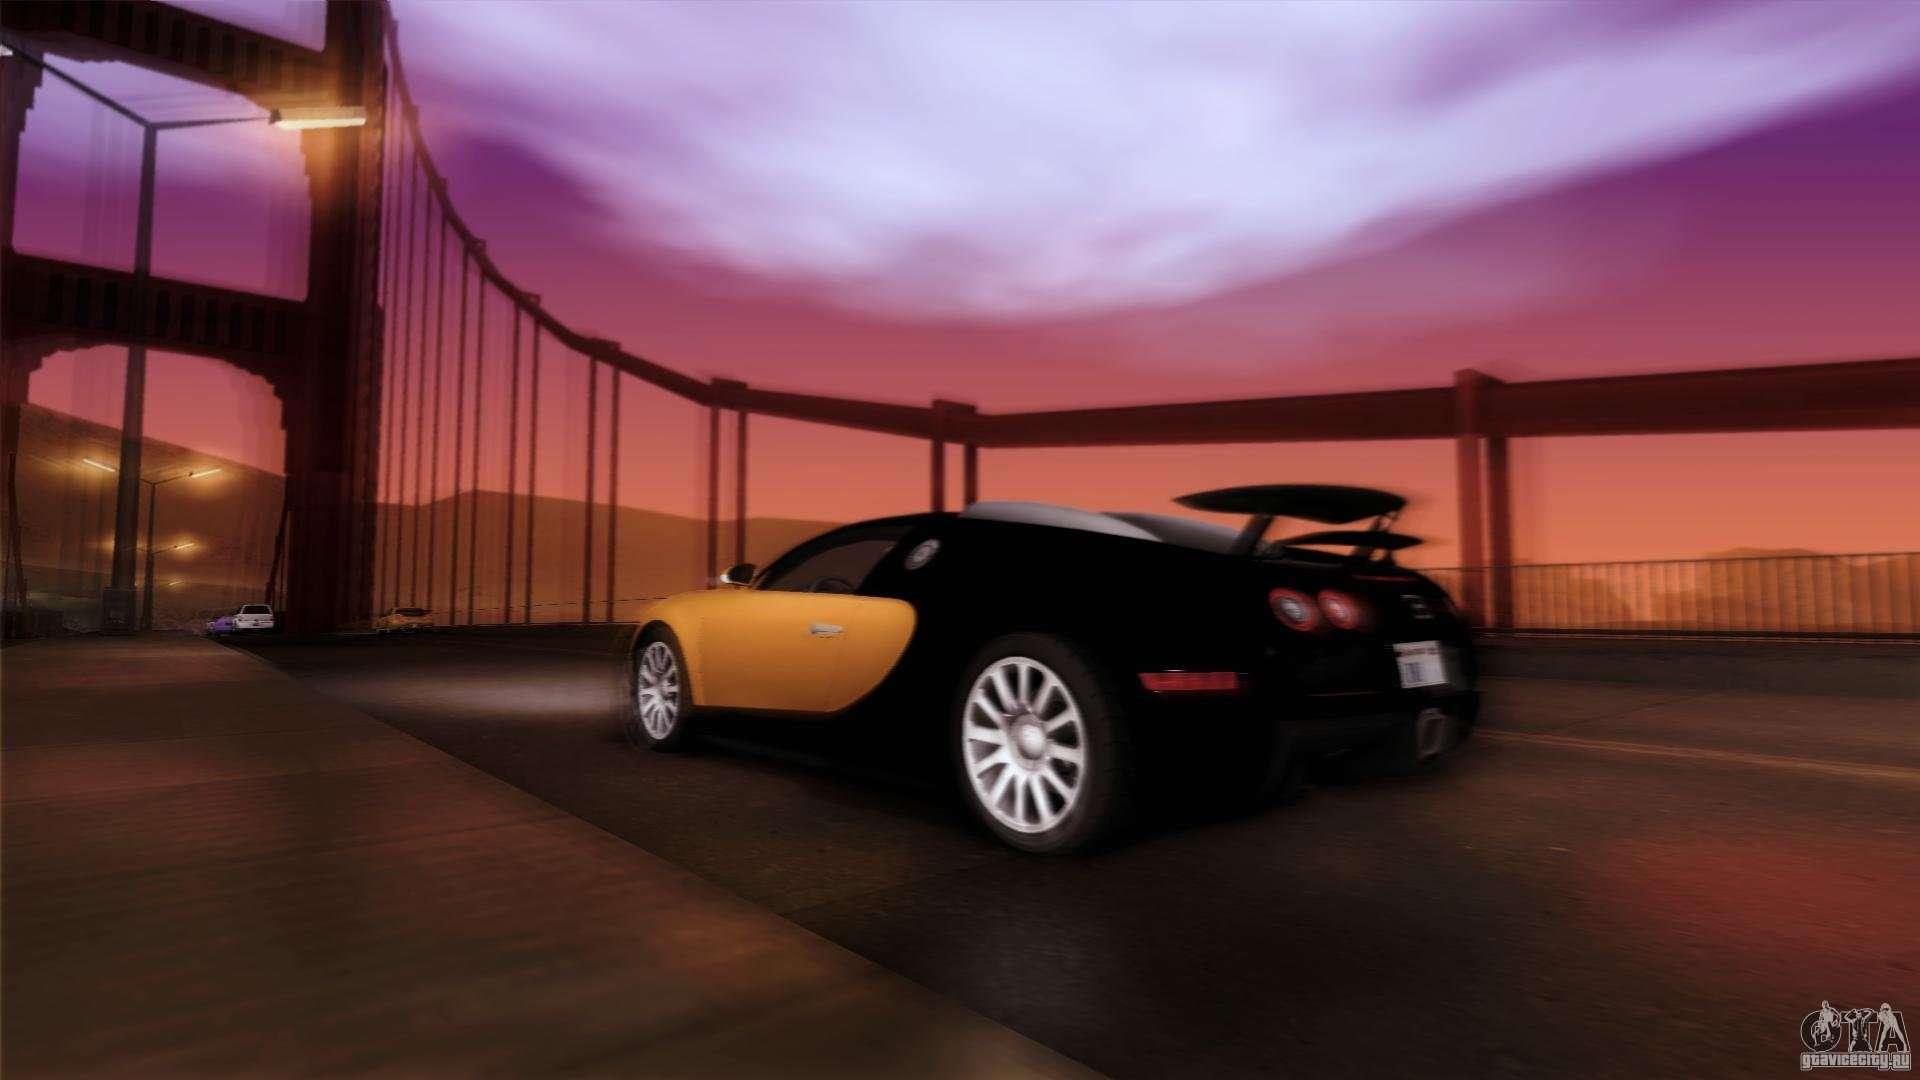 47517-1346245558-gta-sa2012-08-2916-54-49-67 Terrific Bugatti Veyron Mod Gta Sa Cars Trend